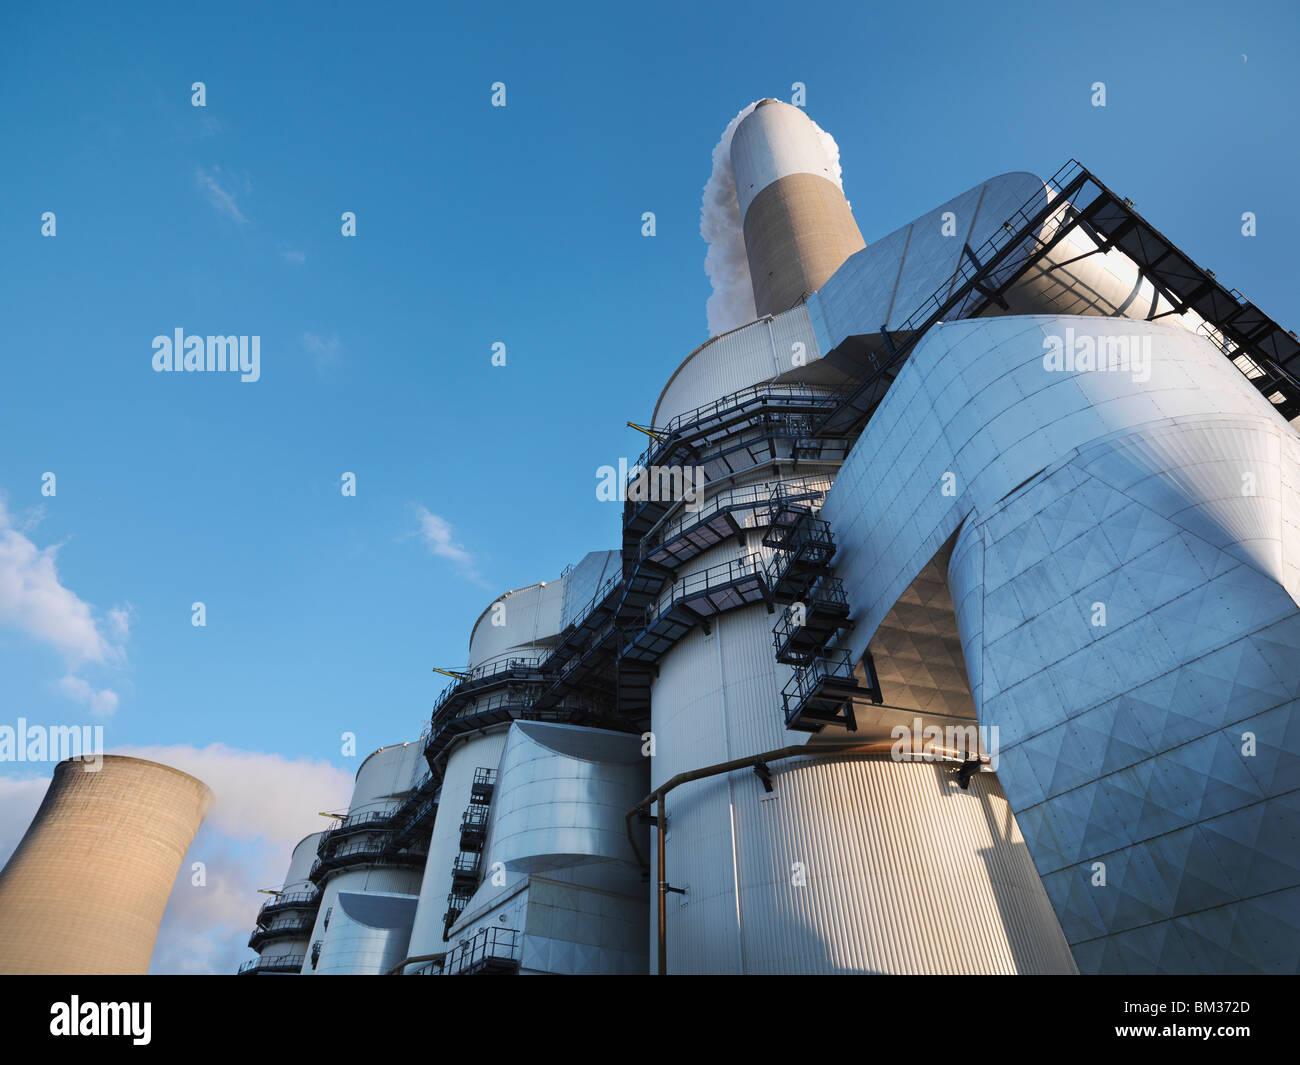 Desulphurisation Plant At Power Station - Stock Image